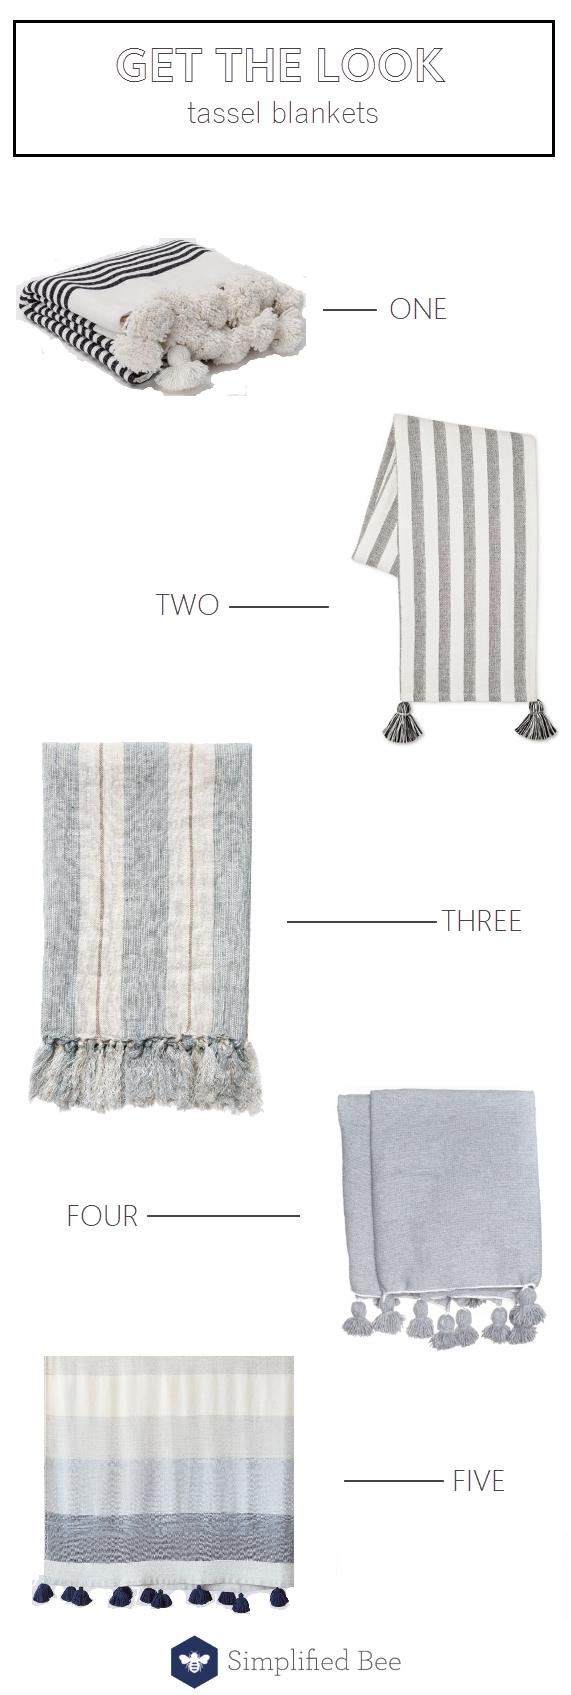 tassel blankets #blankets #tassels